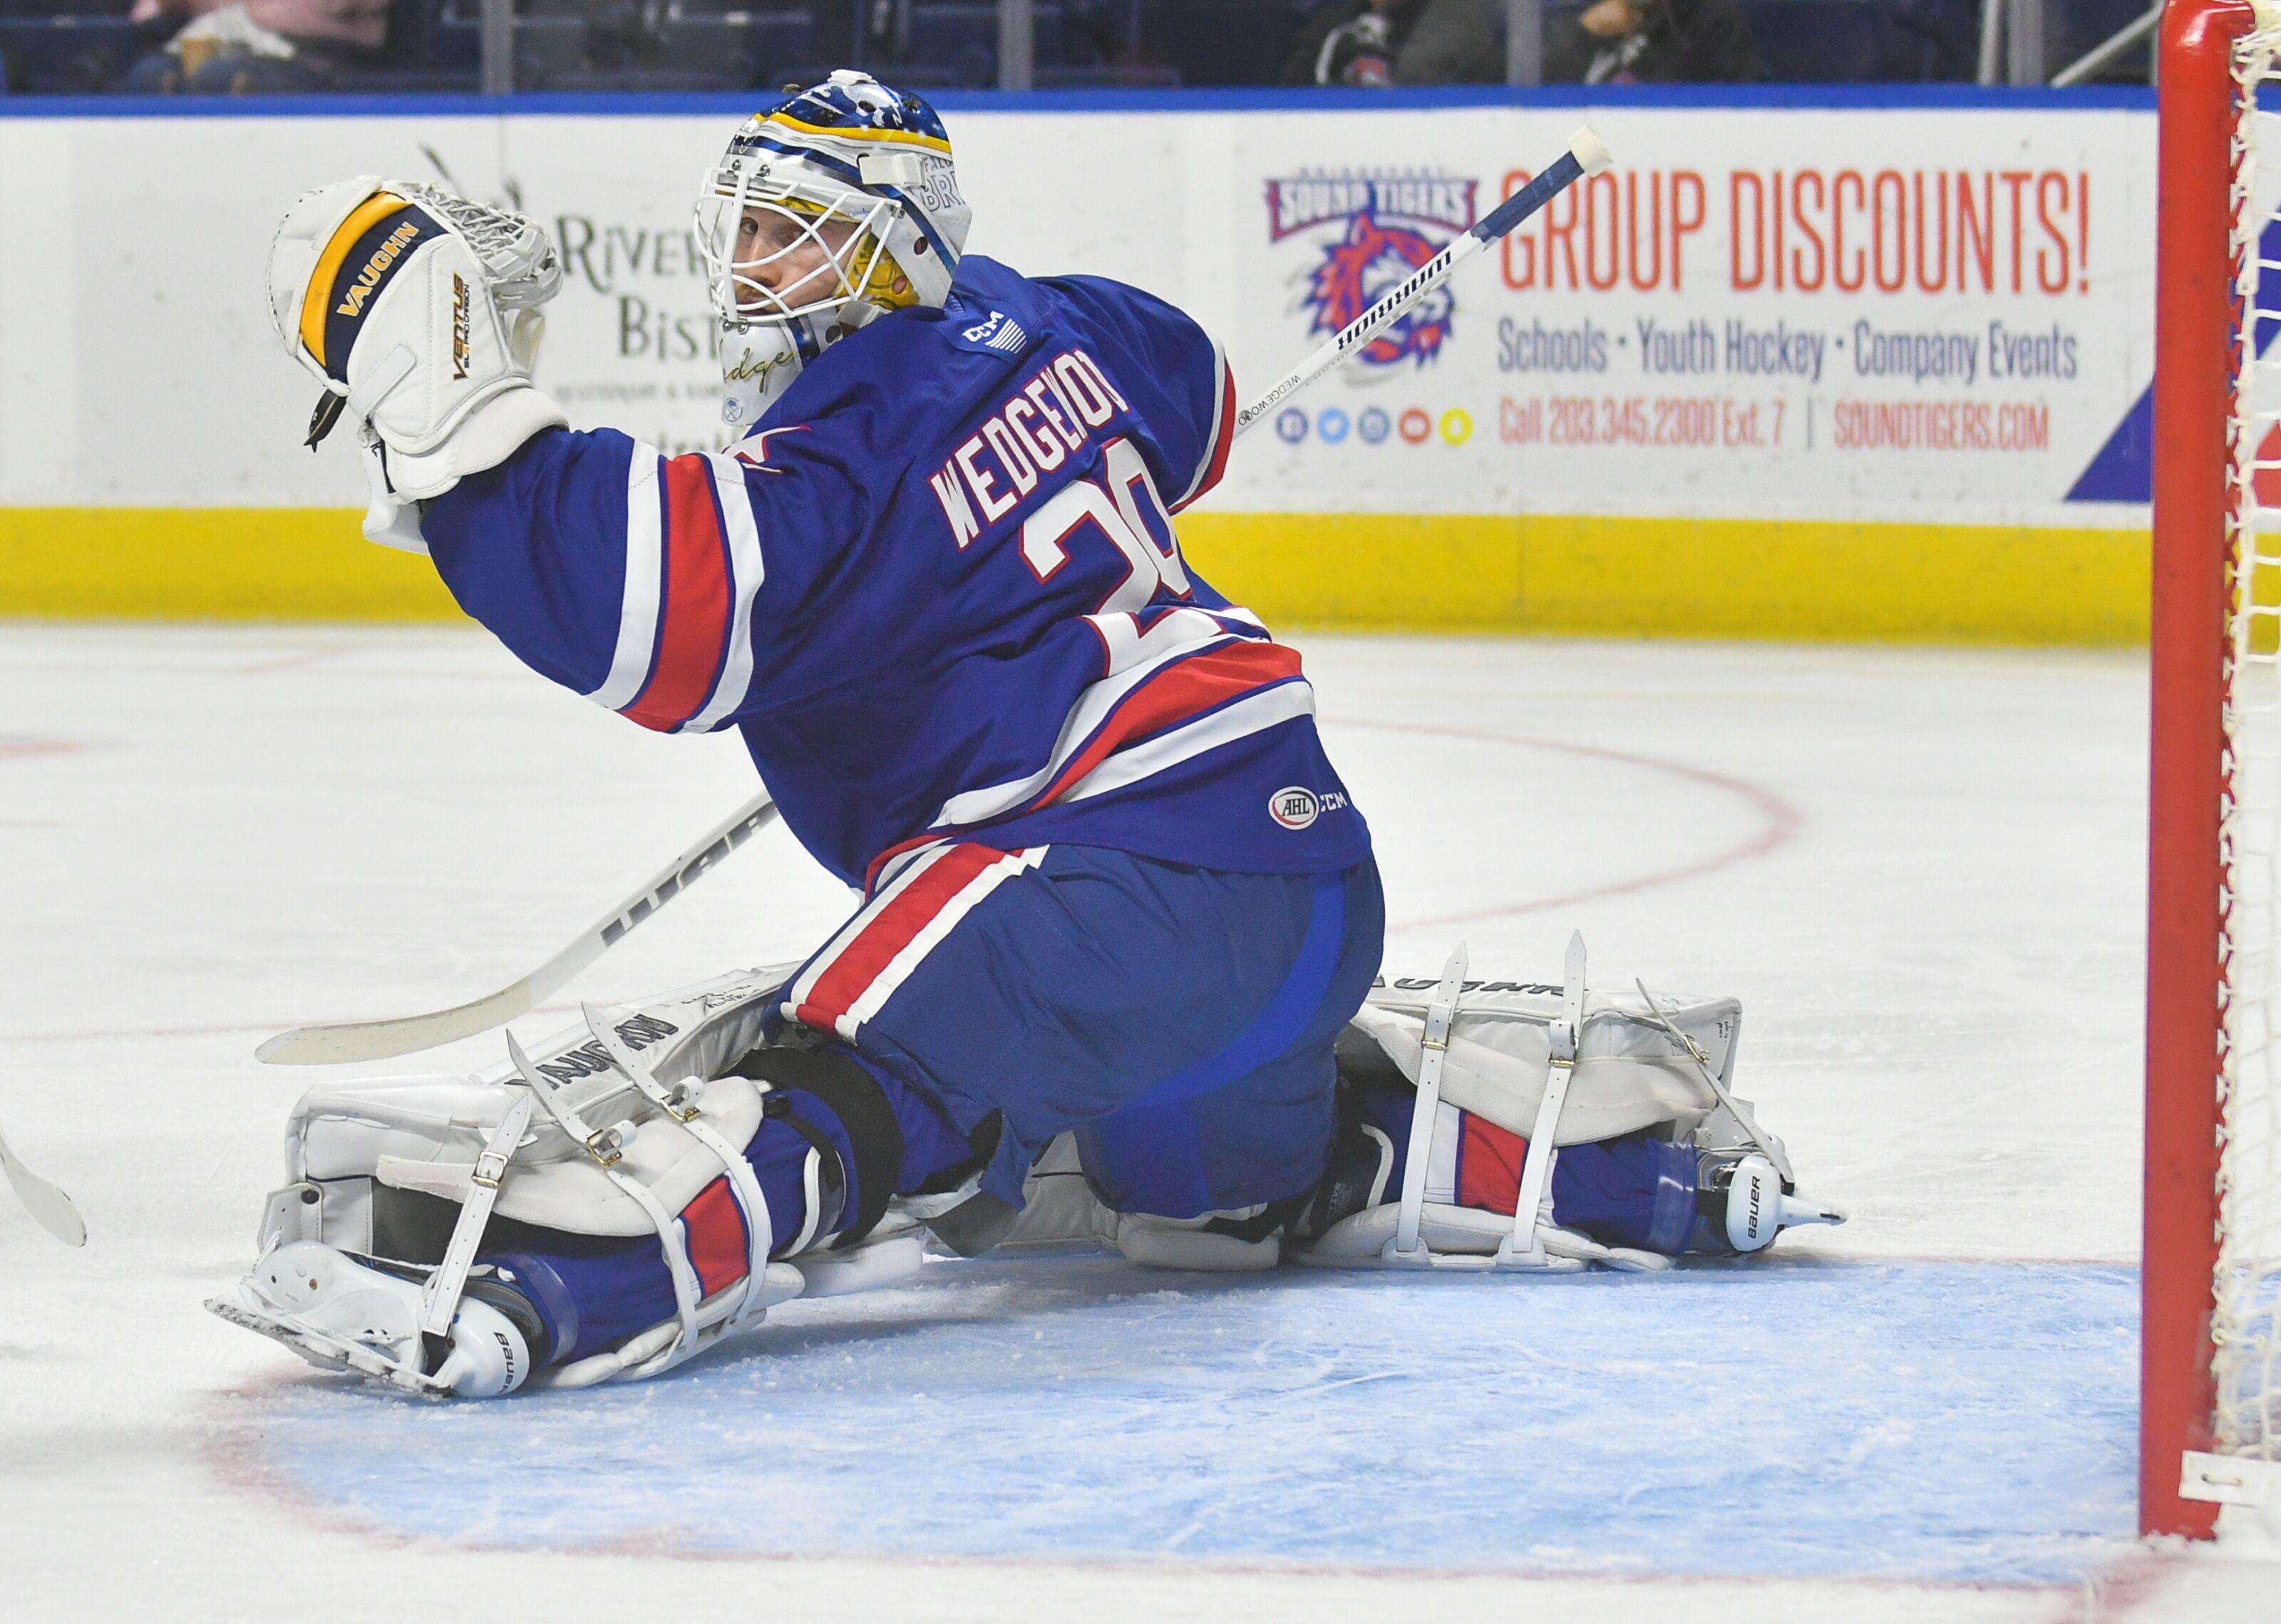 Buffalo Sabres: Ukko-Pekka Luukkonen Recieves Promotion to Rochester